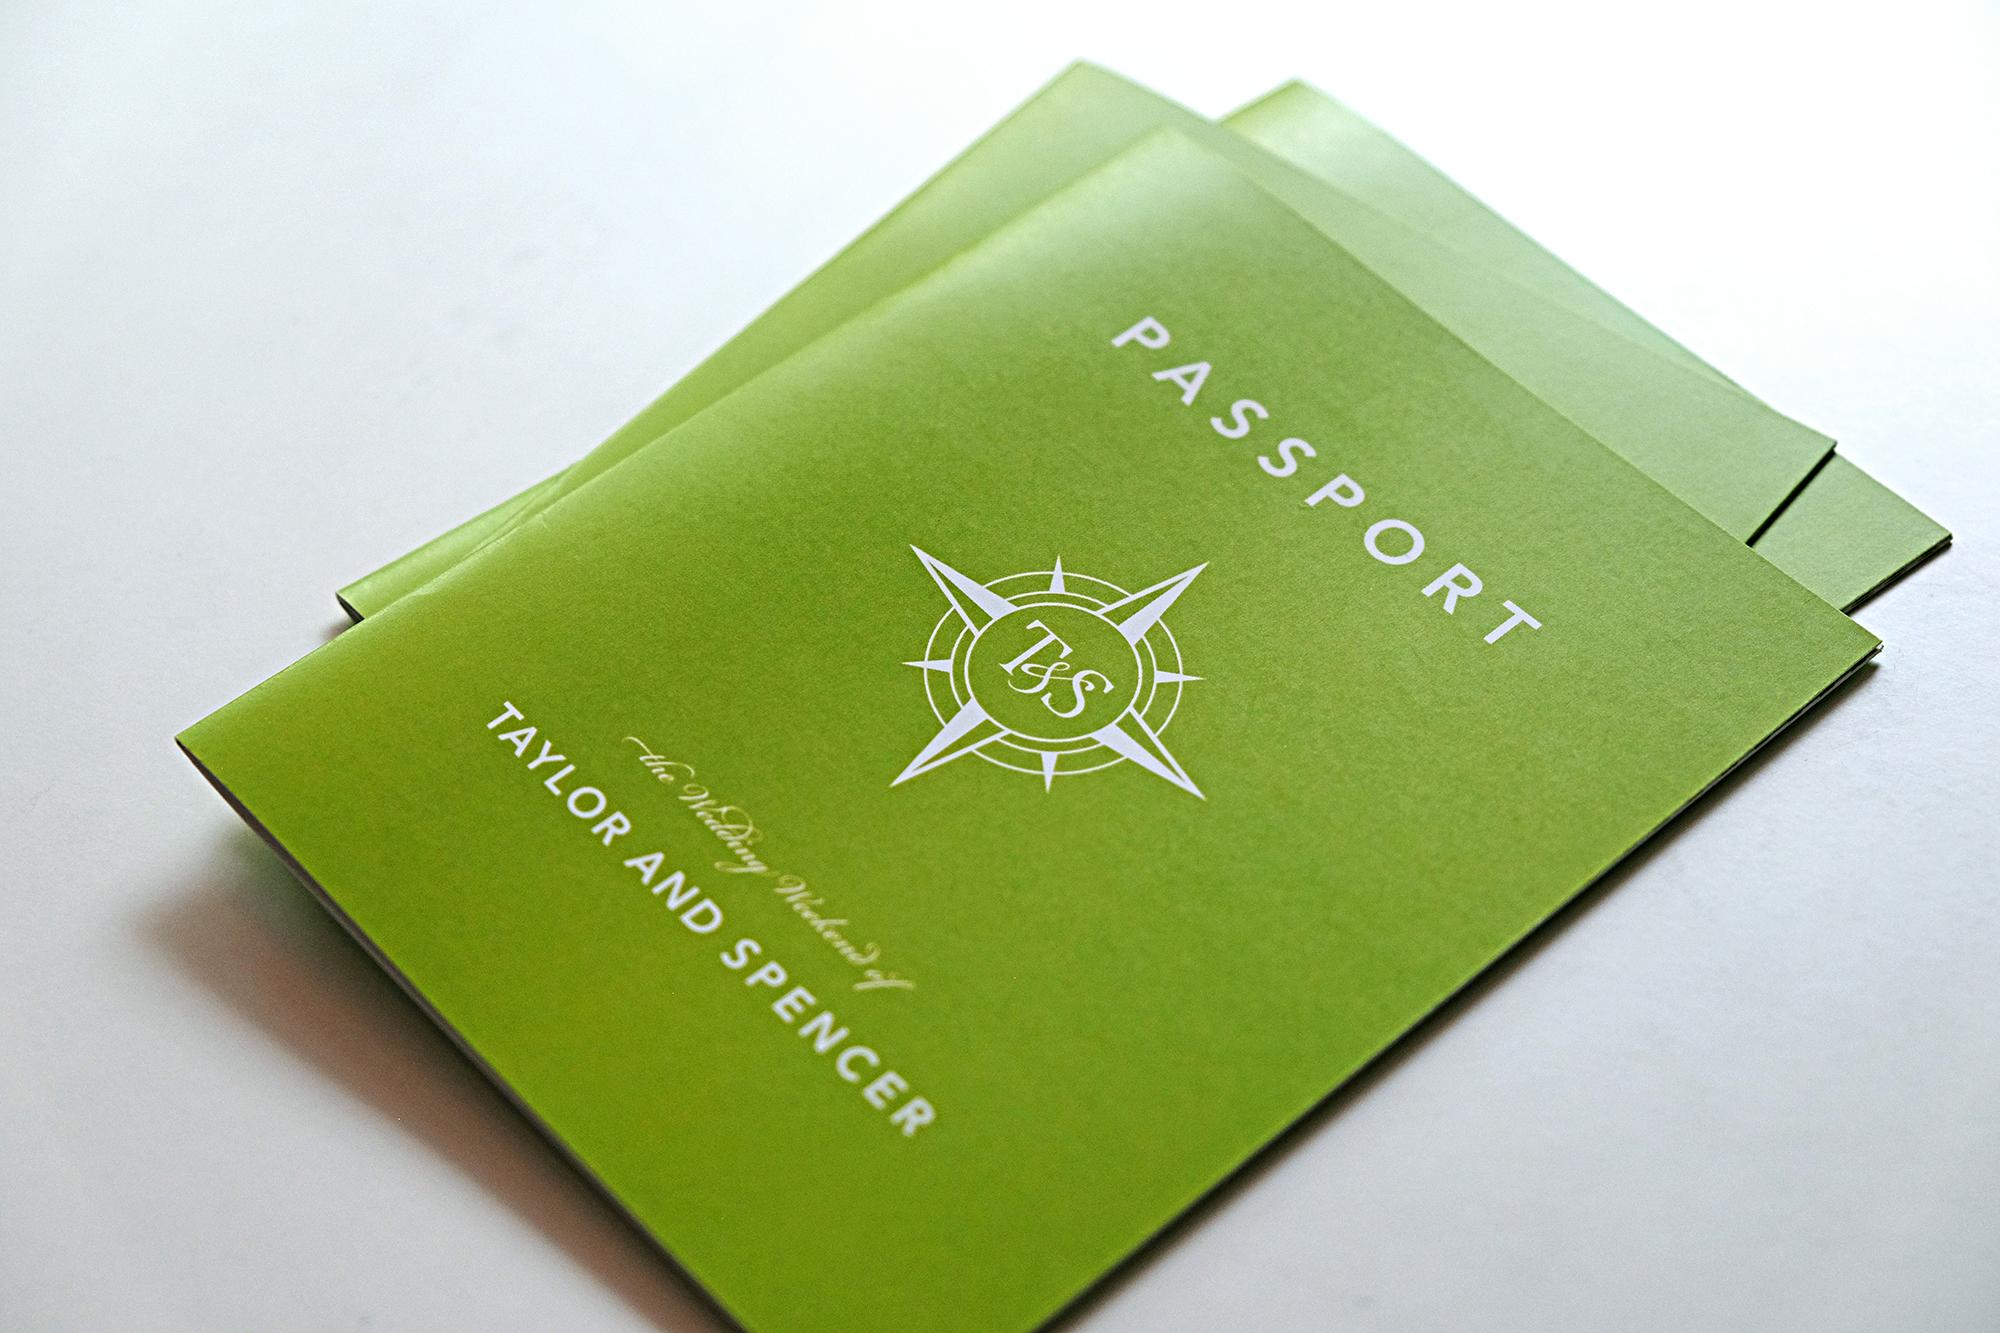 TS_Passport.jpg